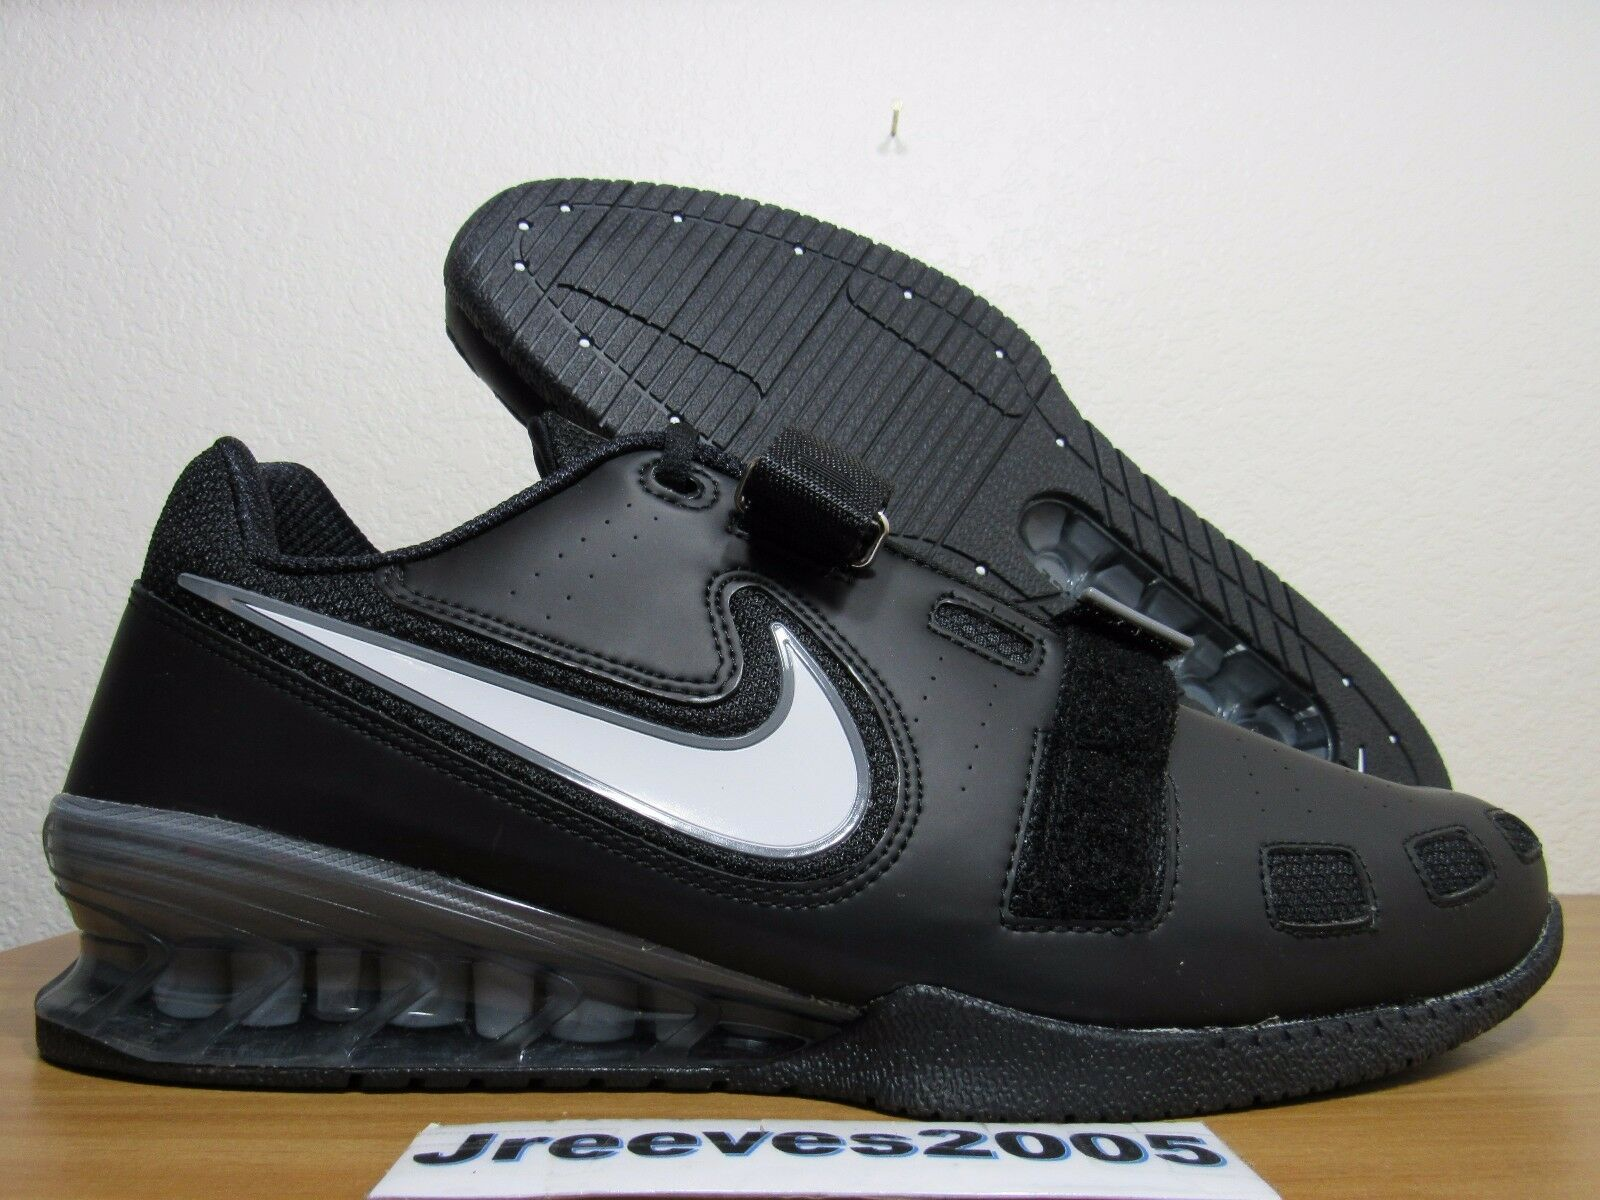 Nike romaleos 2 krafttraining sz 15 100% 100% 100% authentische powerlifting schwarz 476927 010 f76f81